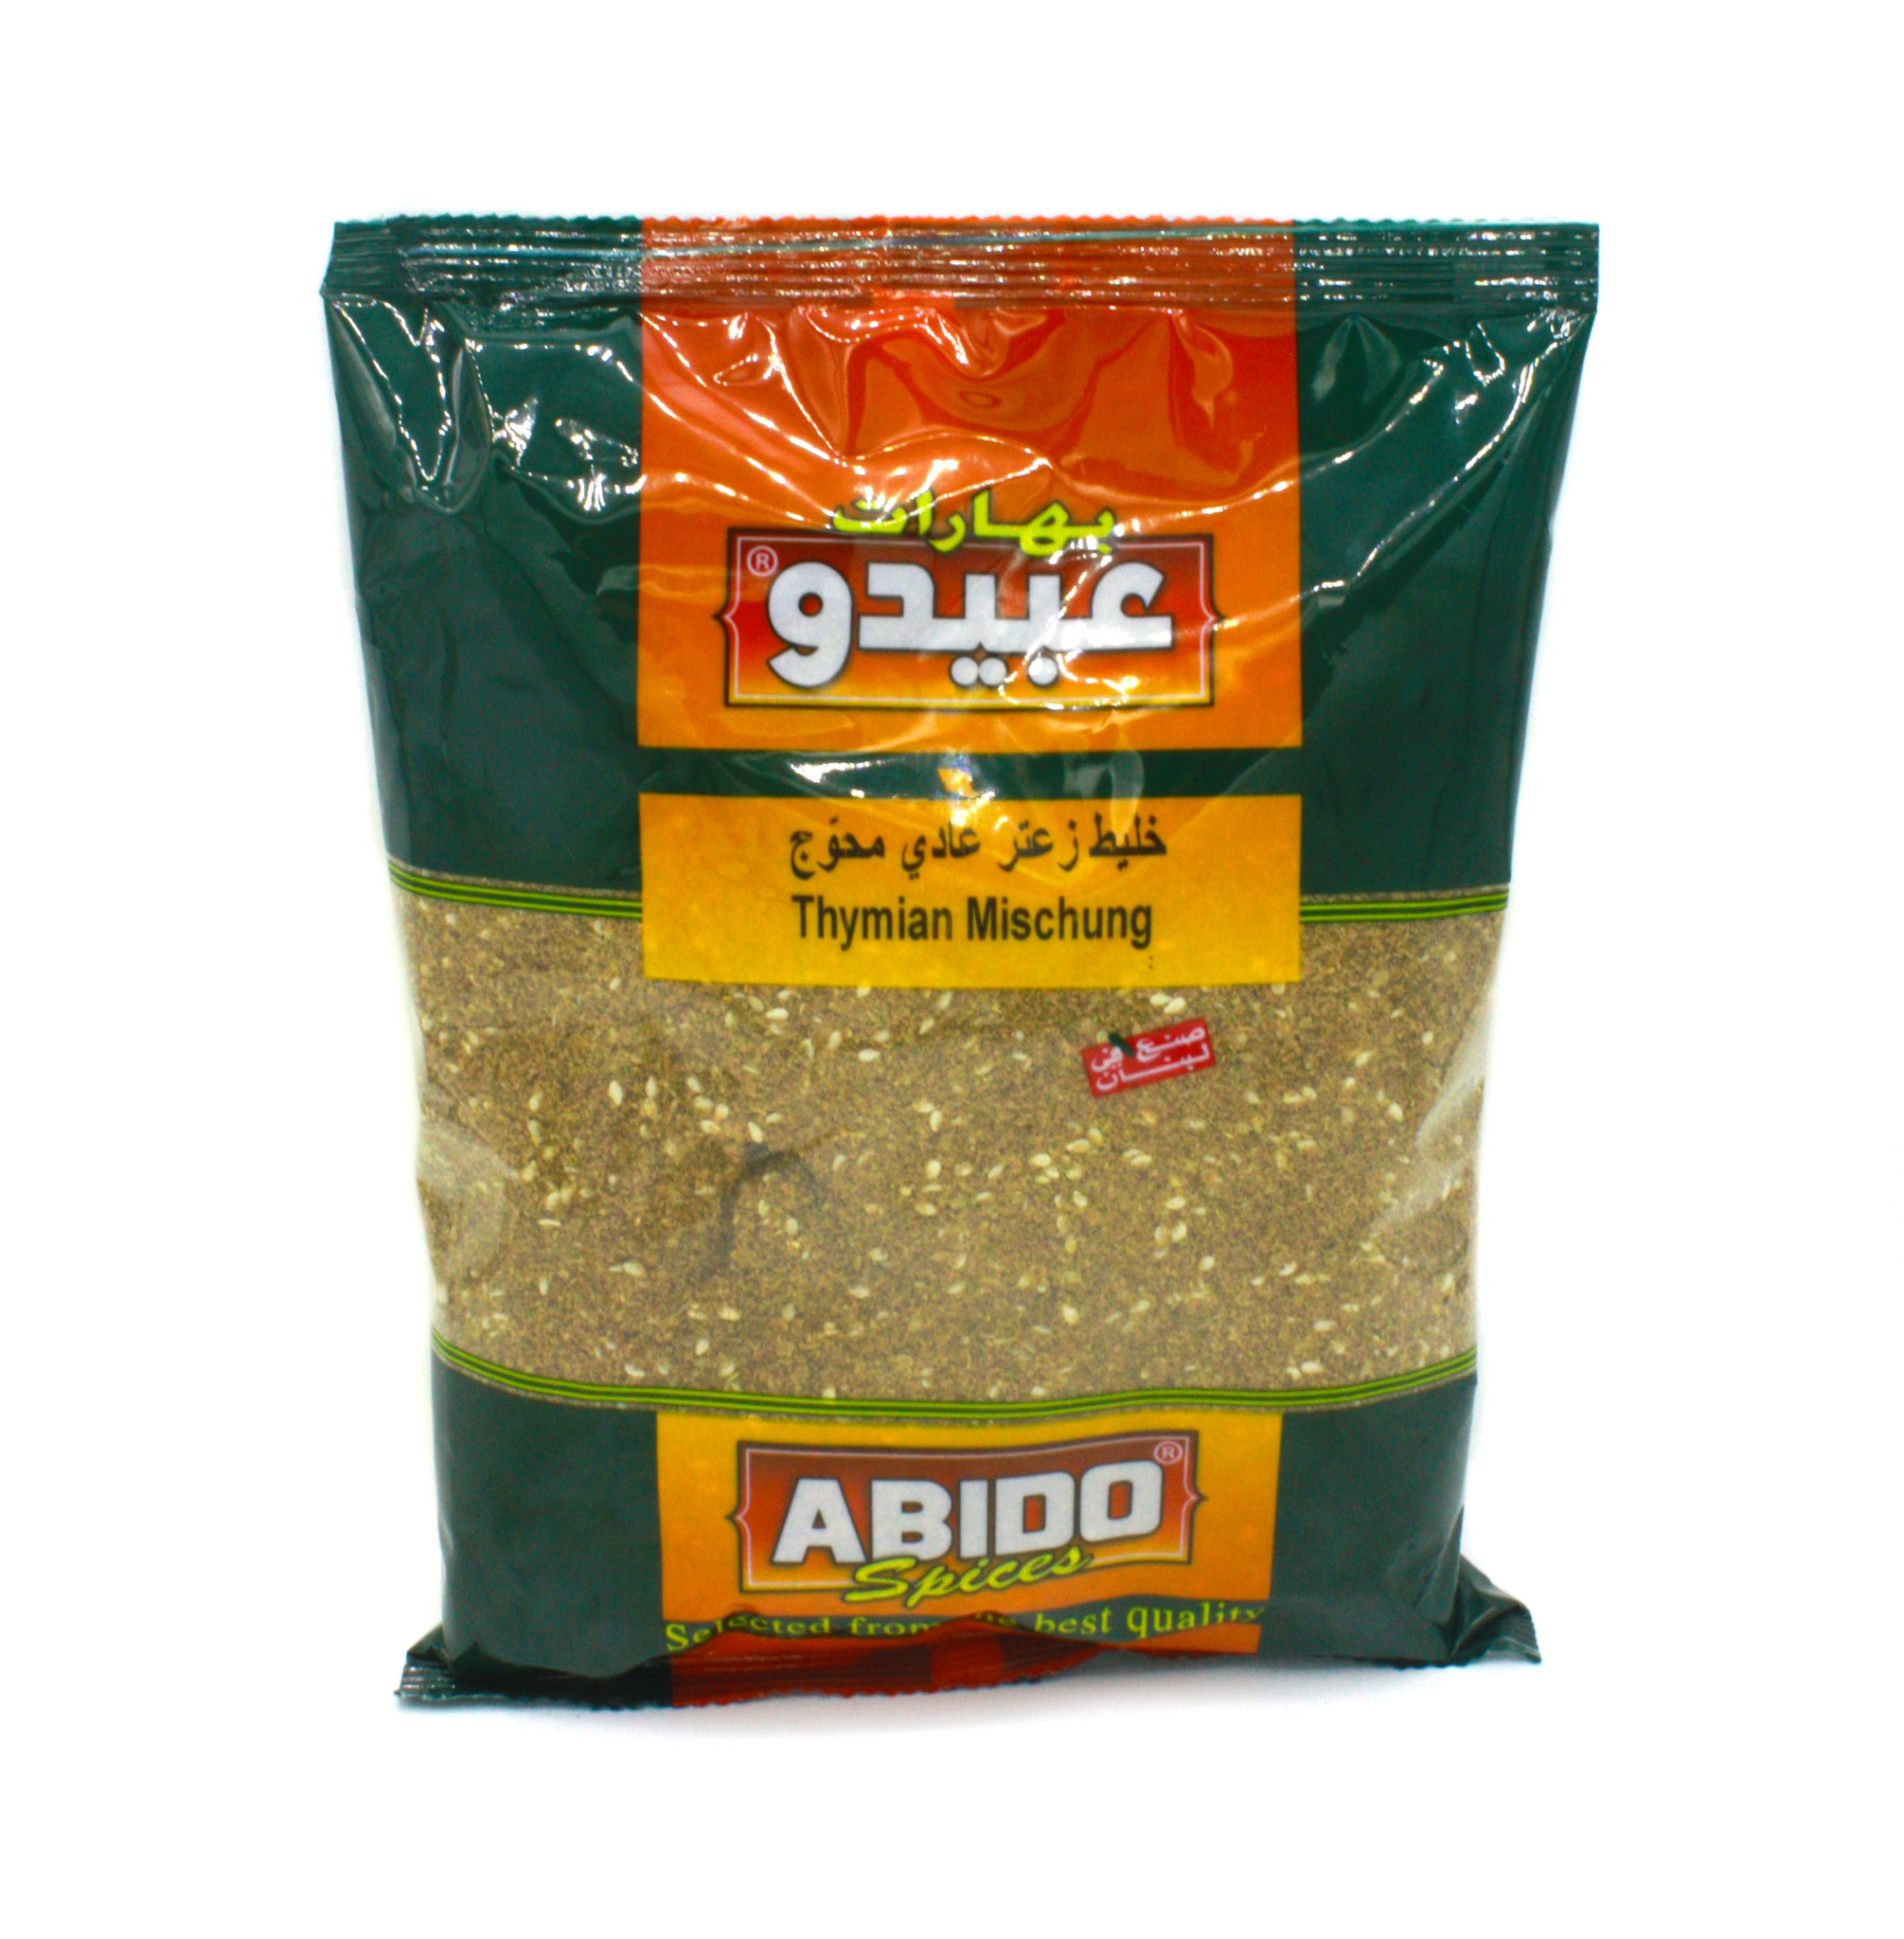 Специи Затар, Abido Spices, 500 г import_files_0c_0cd0a4c6708911e8ae08448a5b3752ae_02065f596fc911e8a996484d7ecee297.jpg